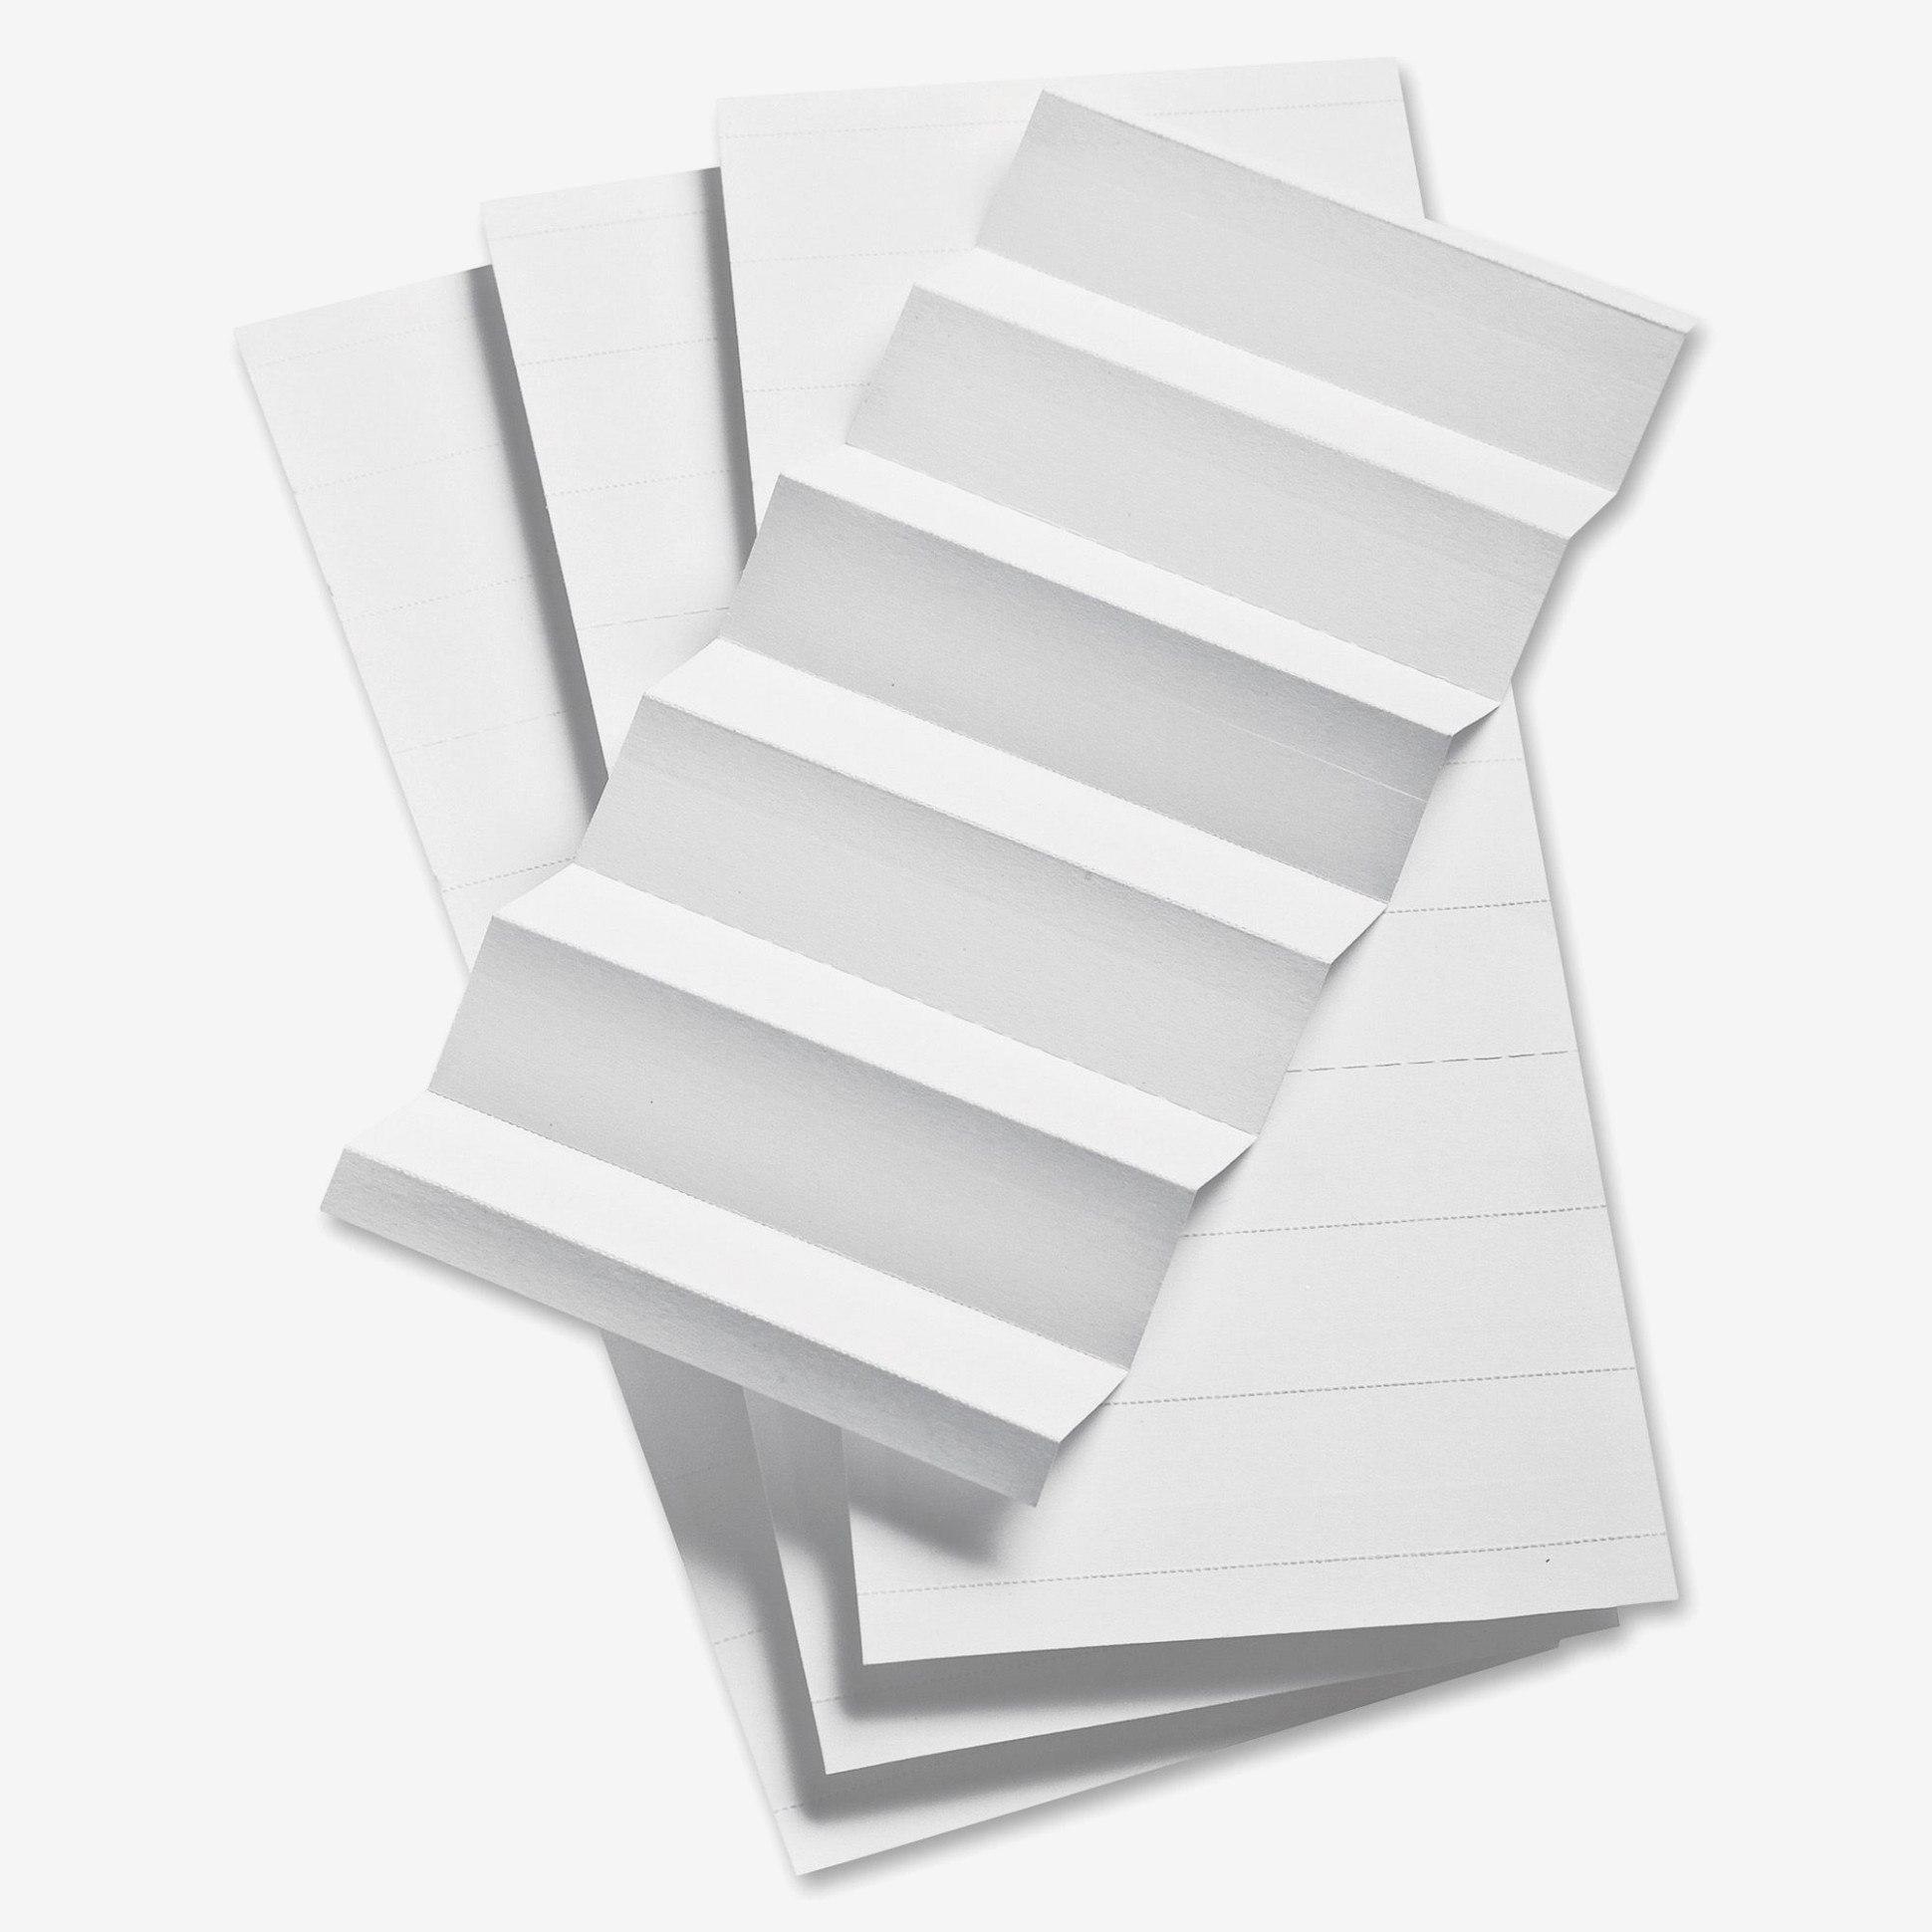 Template For File Folder Labels Free Guide Pendaflex   Cut Regarding Pendaflex Label Template